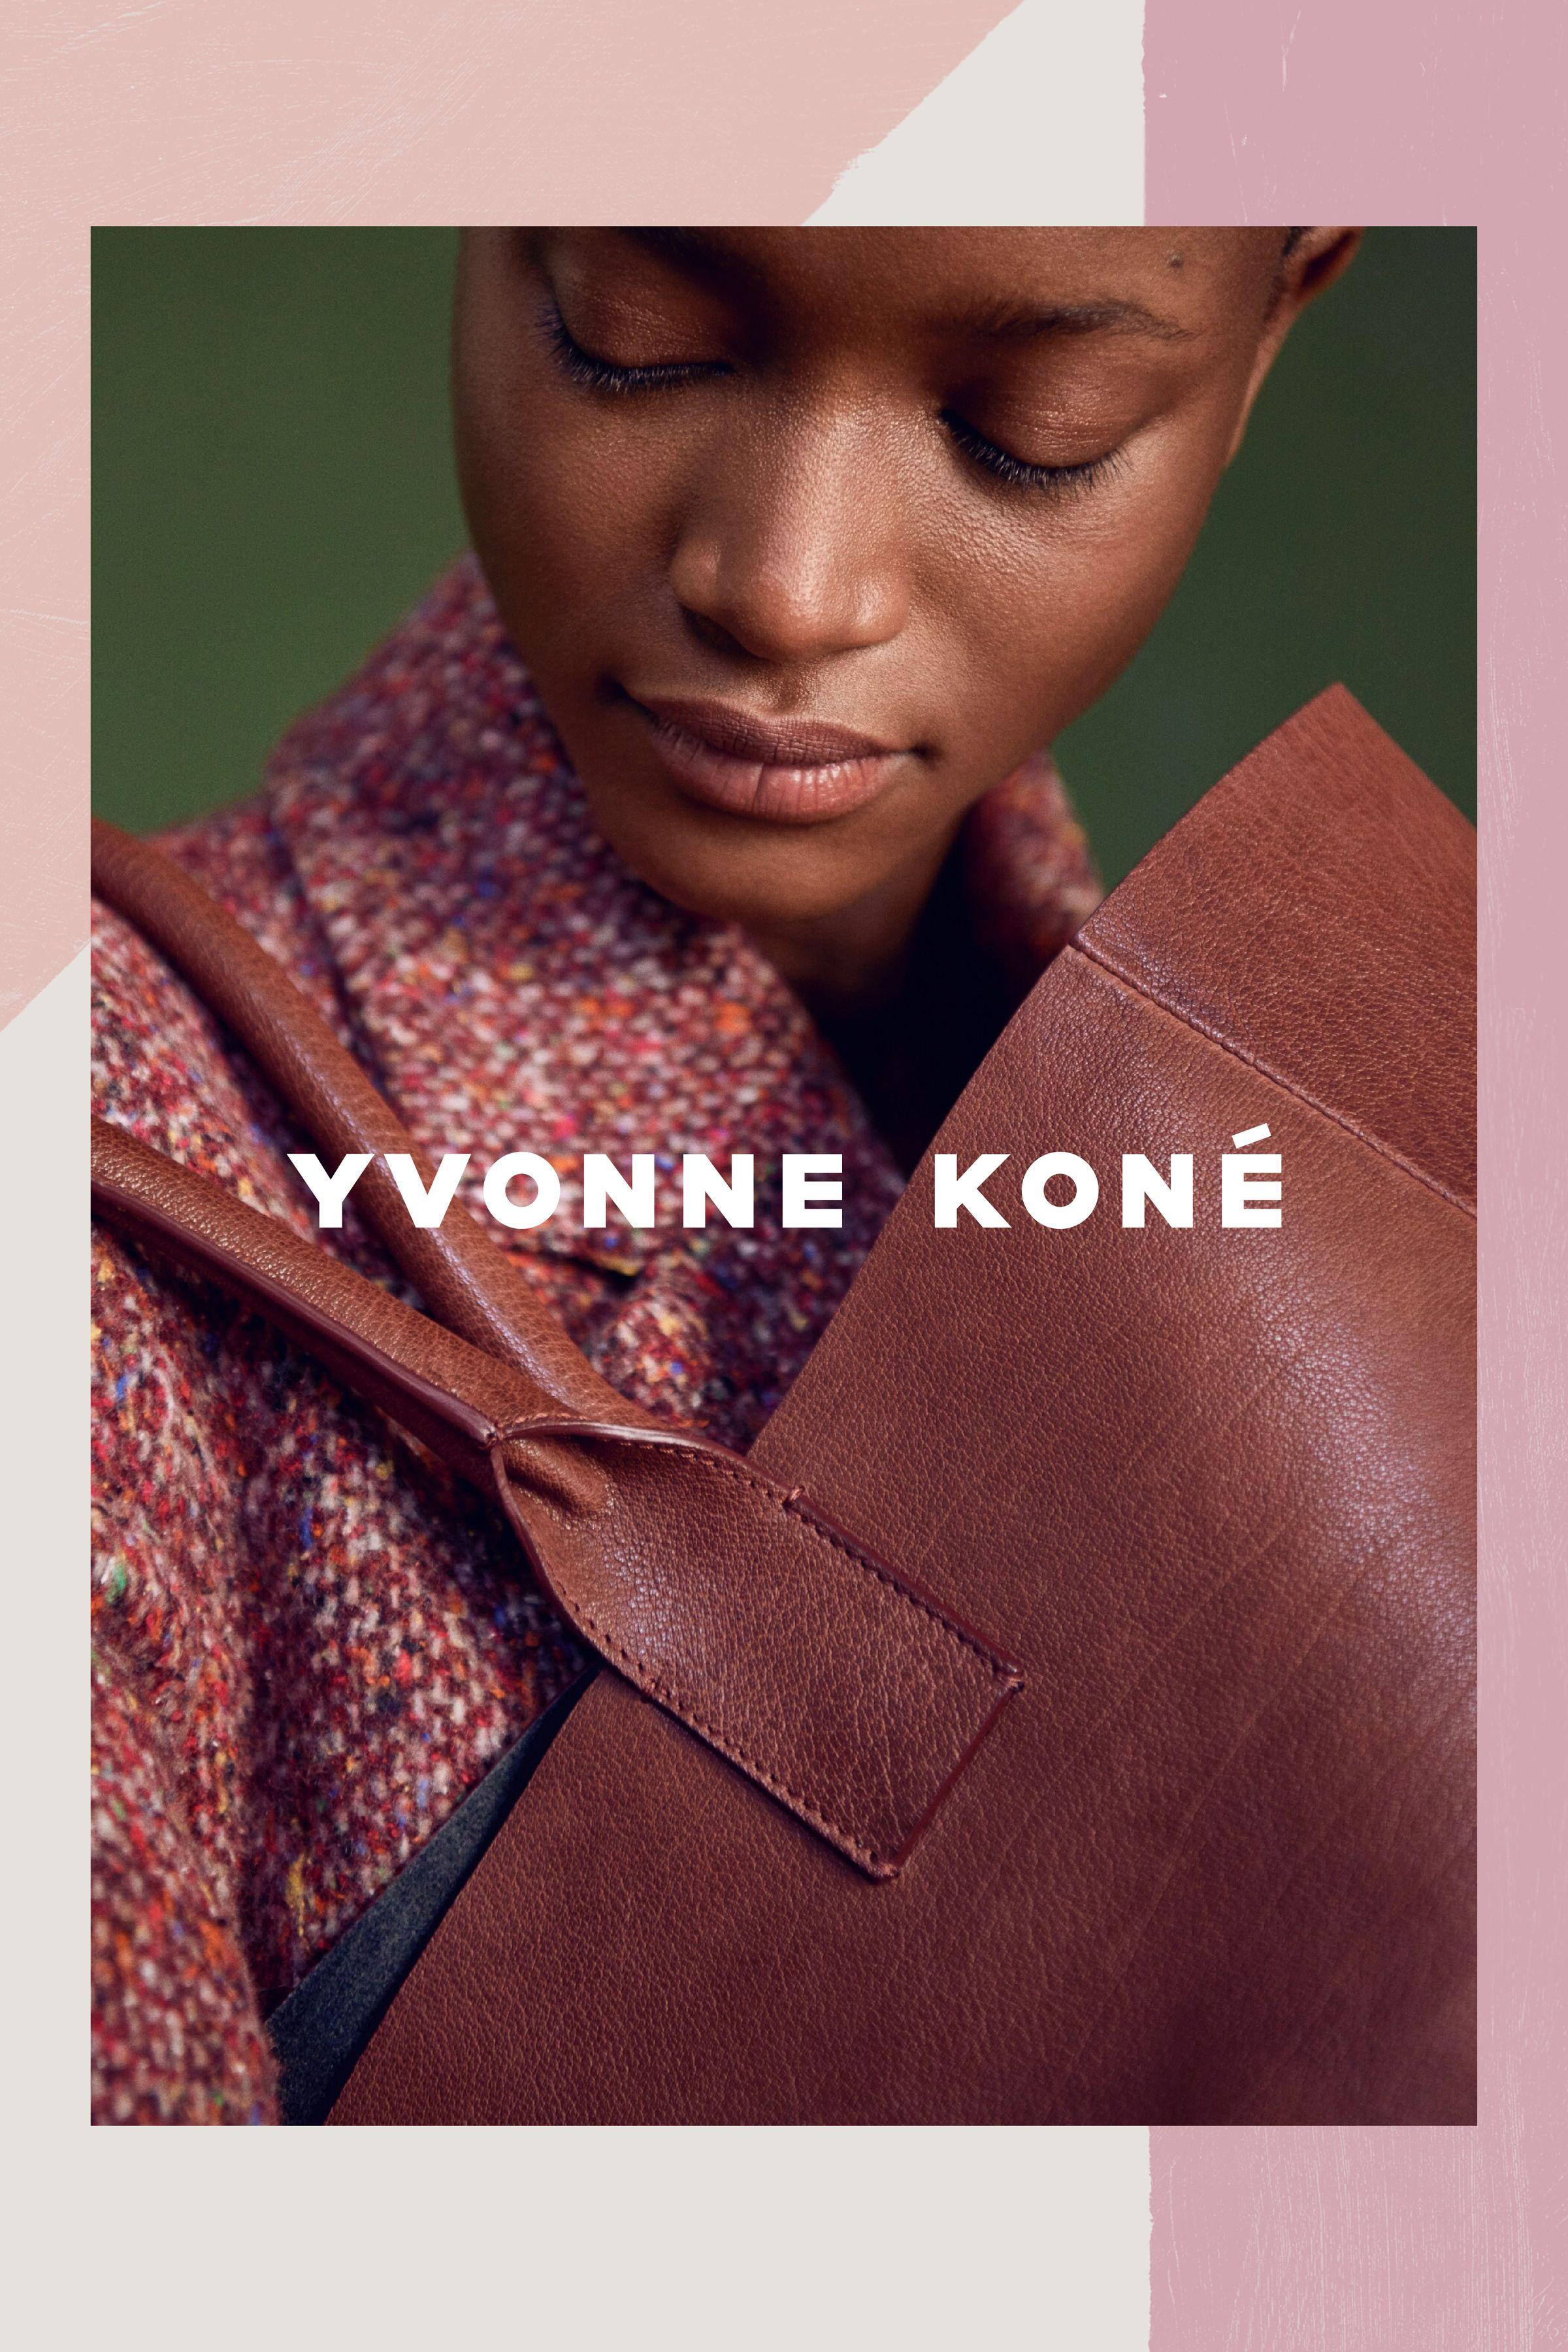 Yvonne Koné campaign image with graphic pattern border